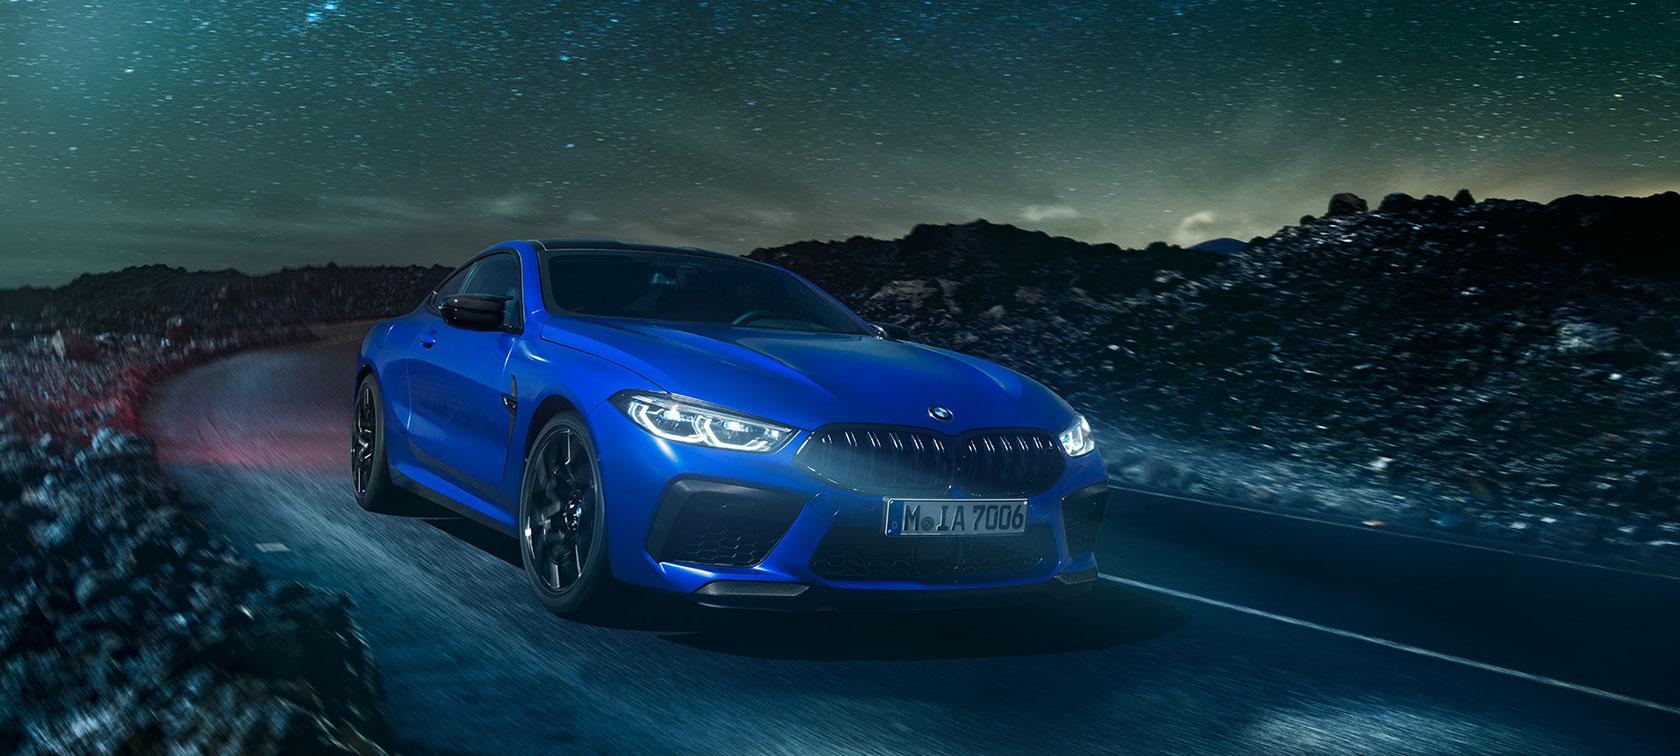 BMW ///M | Tous les modèles | BMW.fr